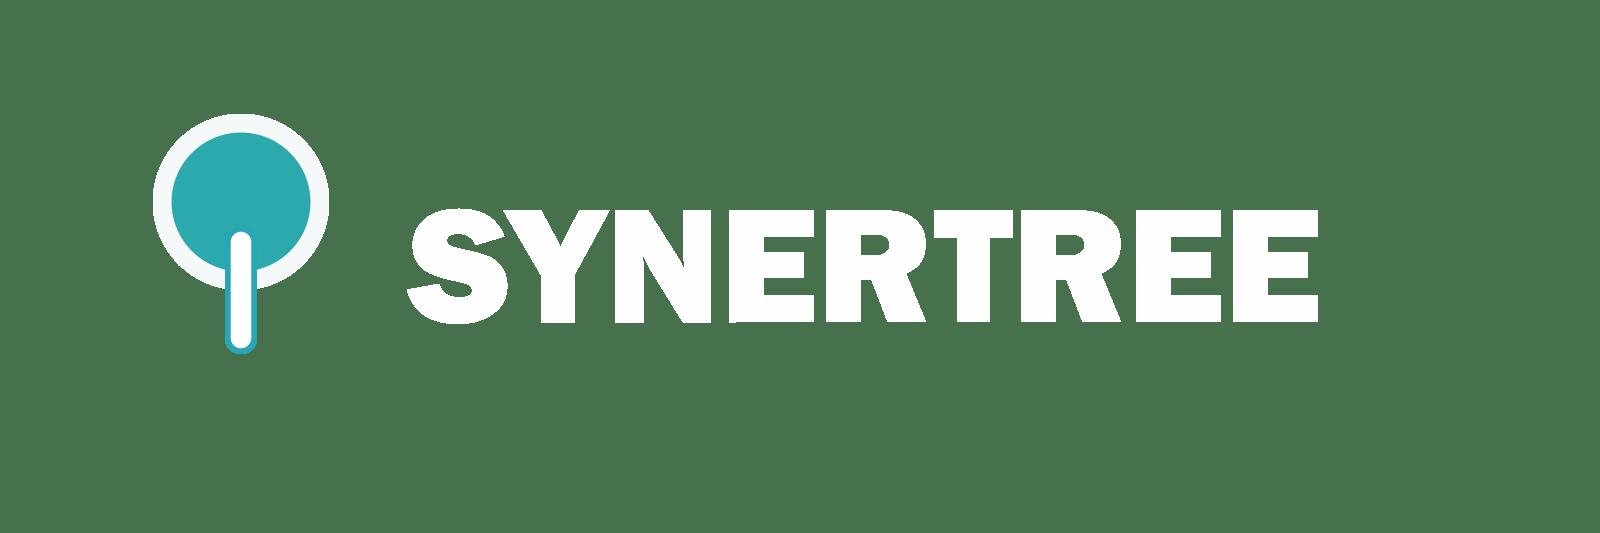 Synertree Capital Management logo